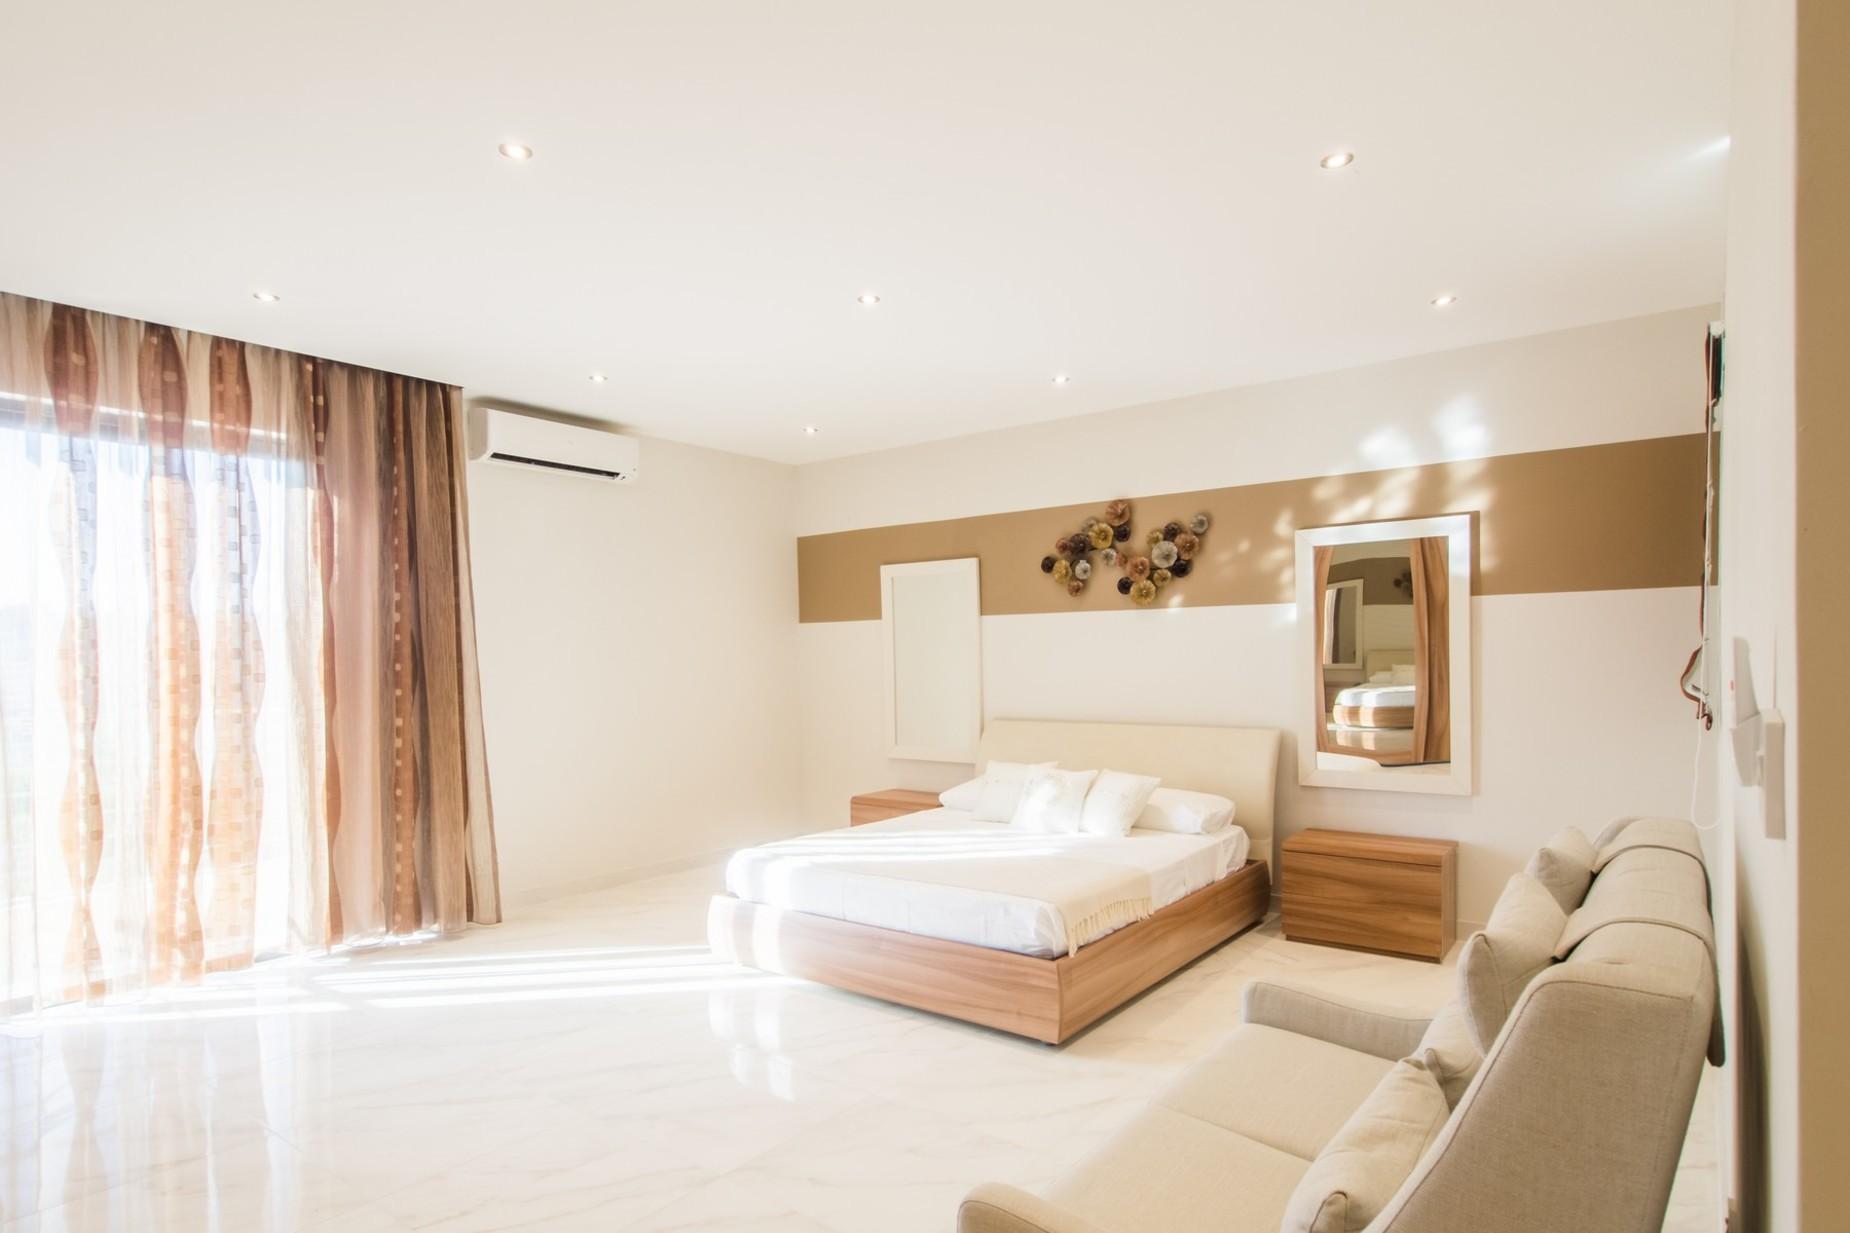 2 bed Apartment For Rent in Xemxija, Xemxija - thumb 13